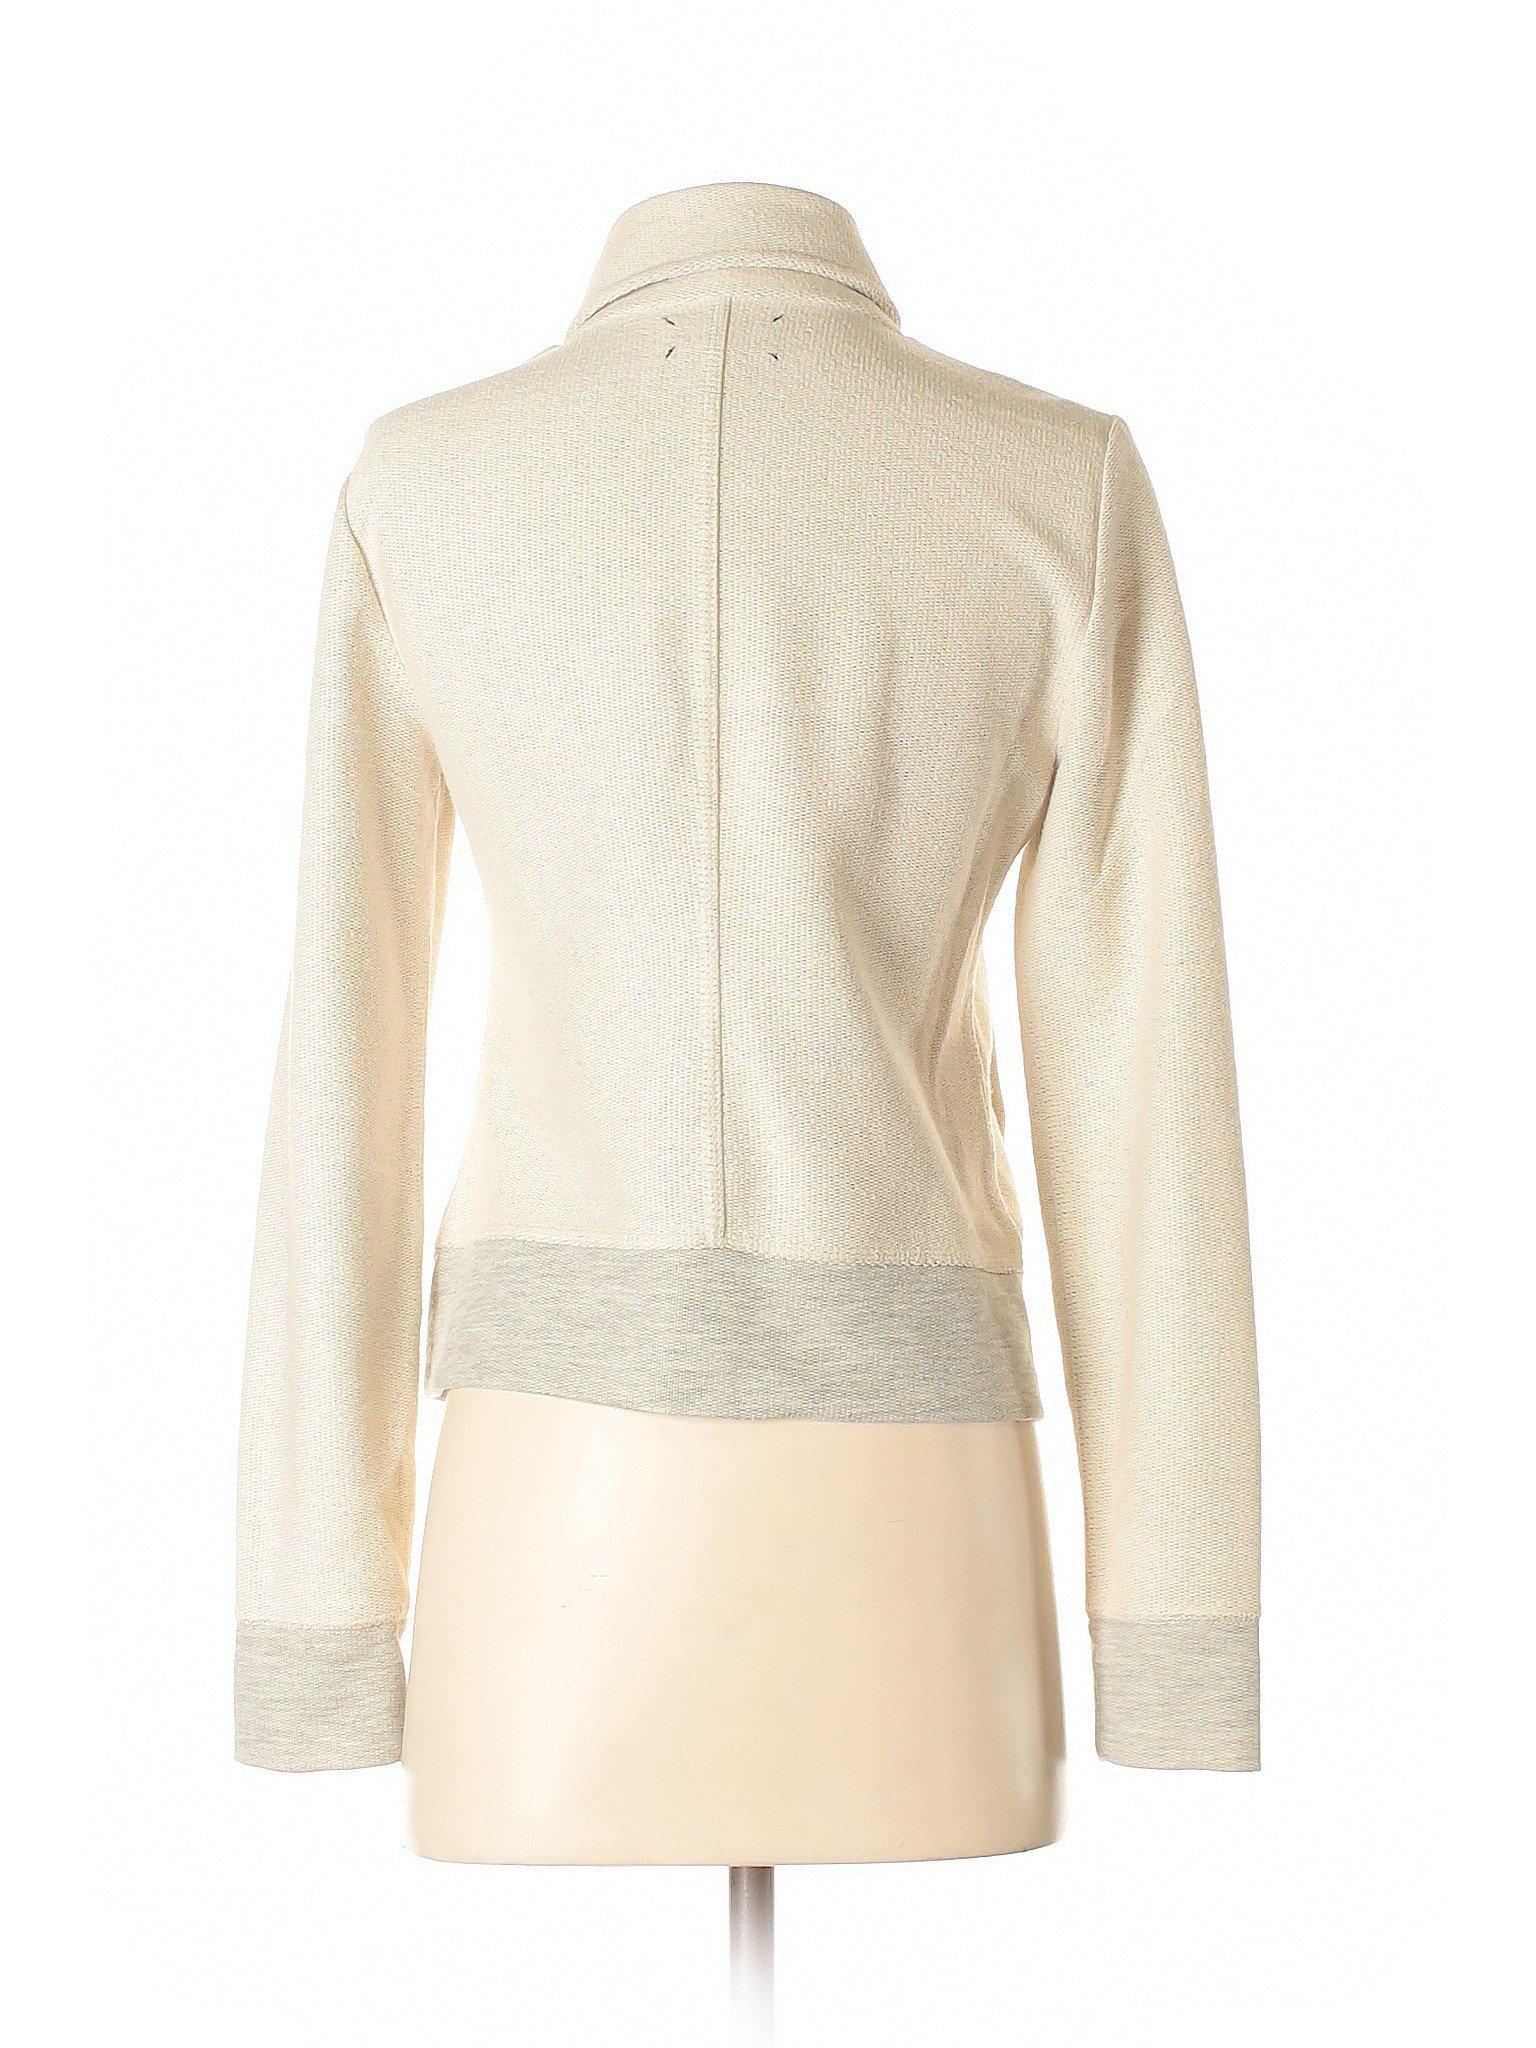 Jacket winter amp; Lou Grey Boutique wUHSqWpSc